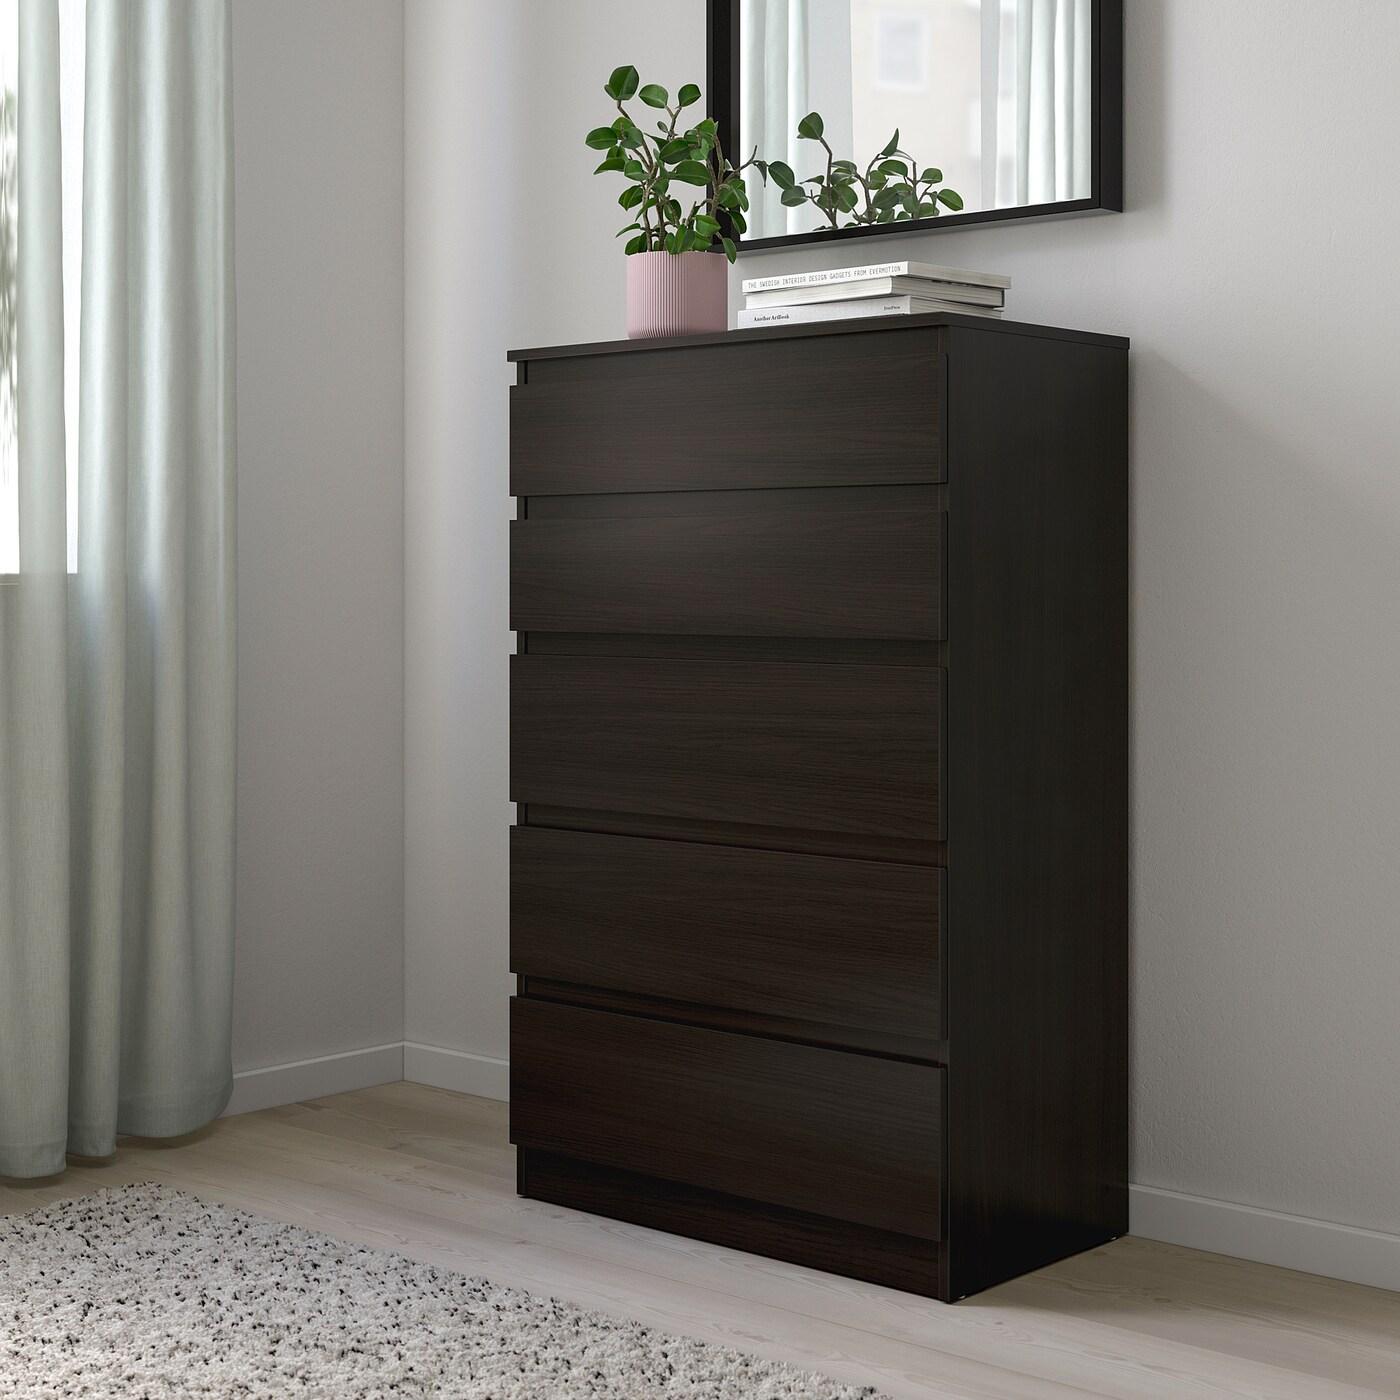 KULLEN Chest of 5 drawers, black-brown, 70x112 cm